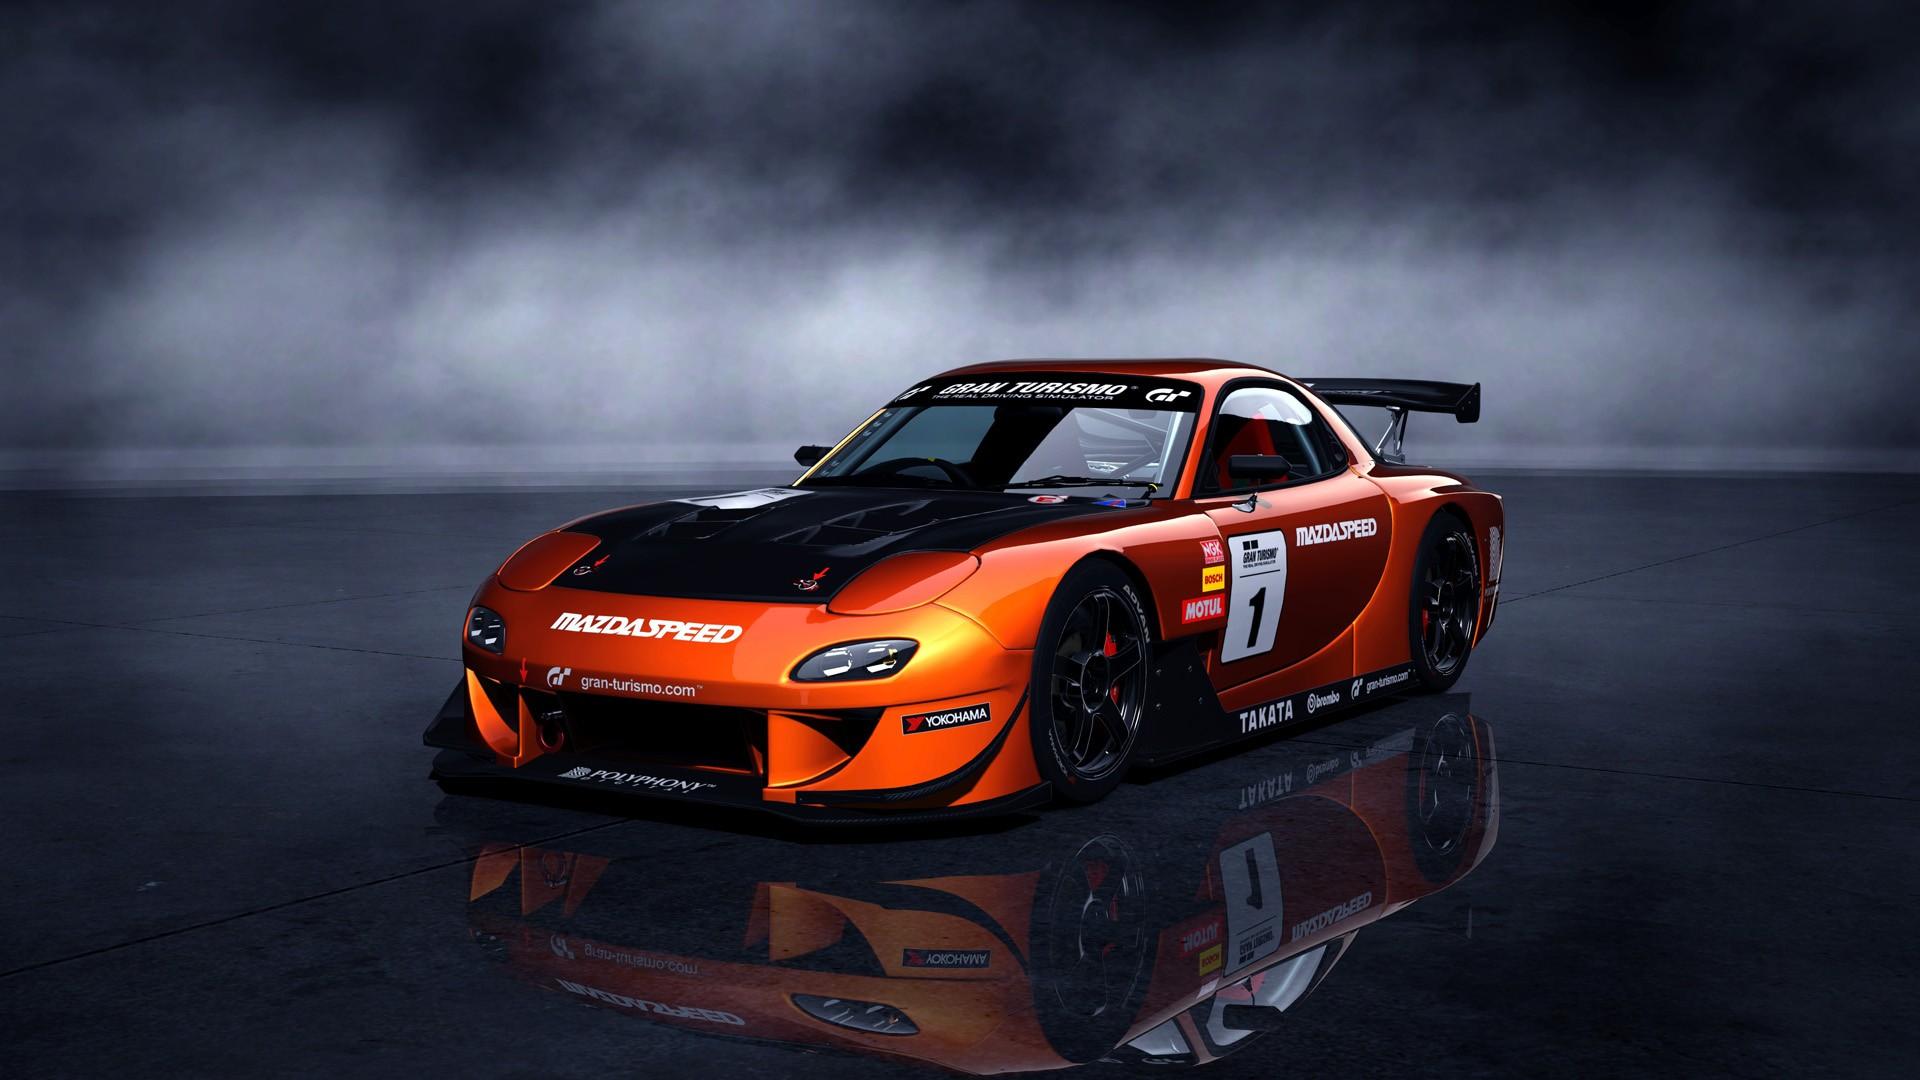 Mazda Rx7 Wallpaper HD